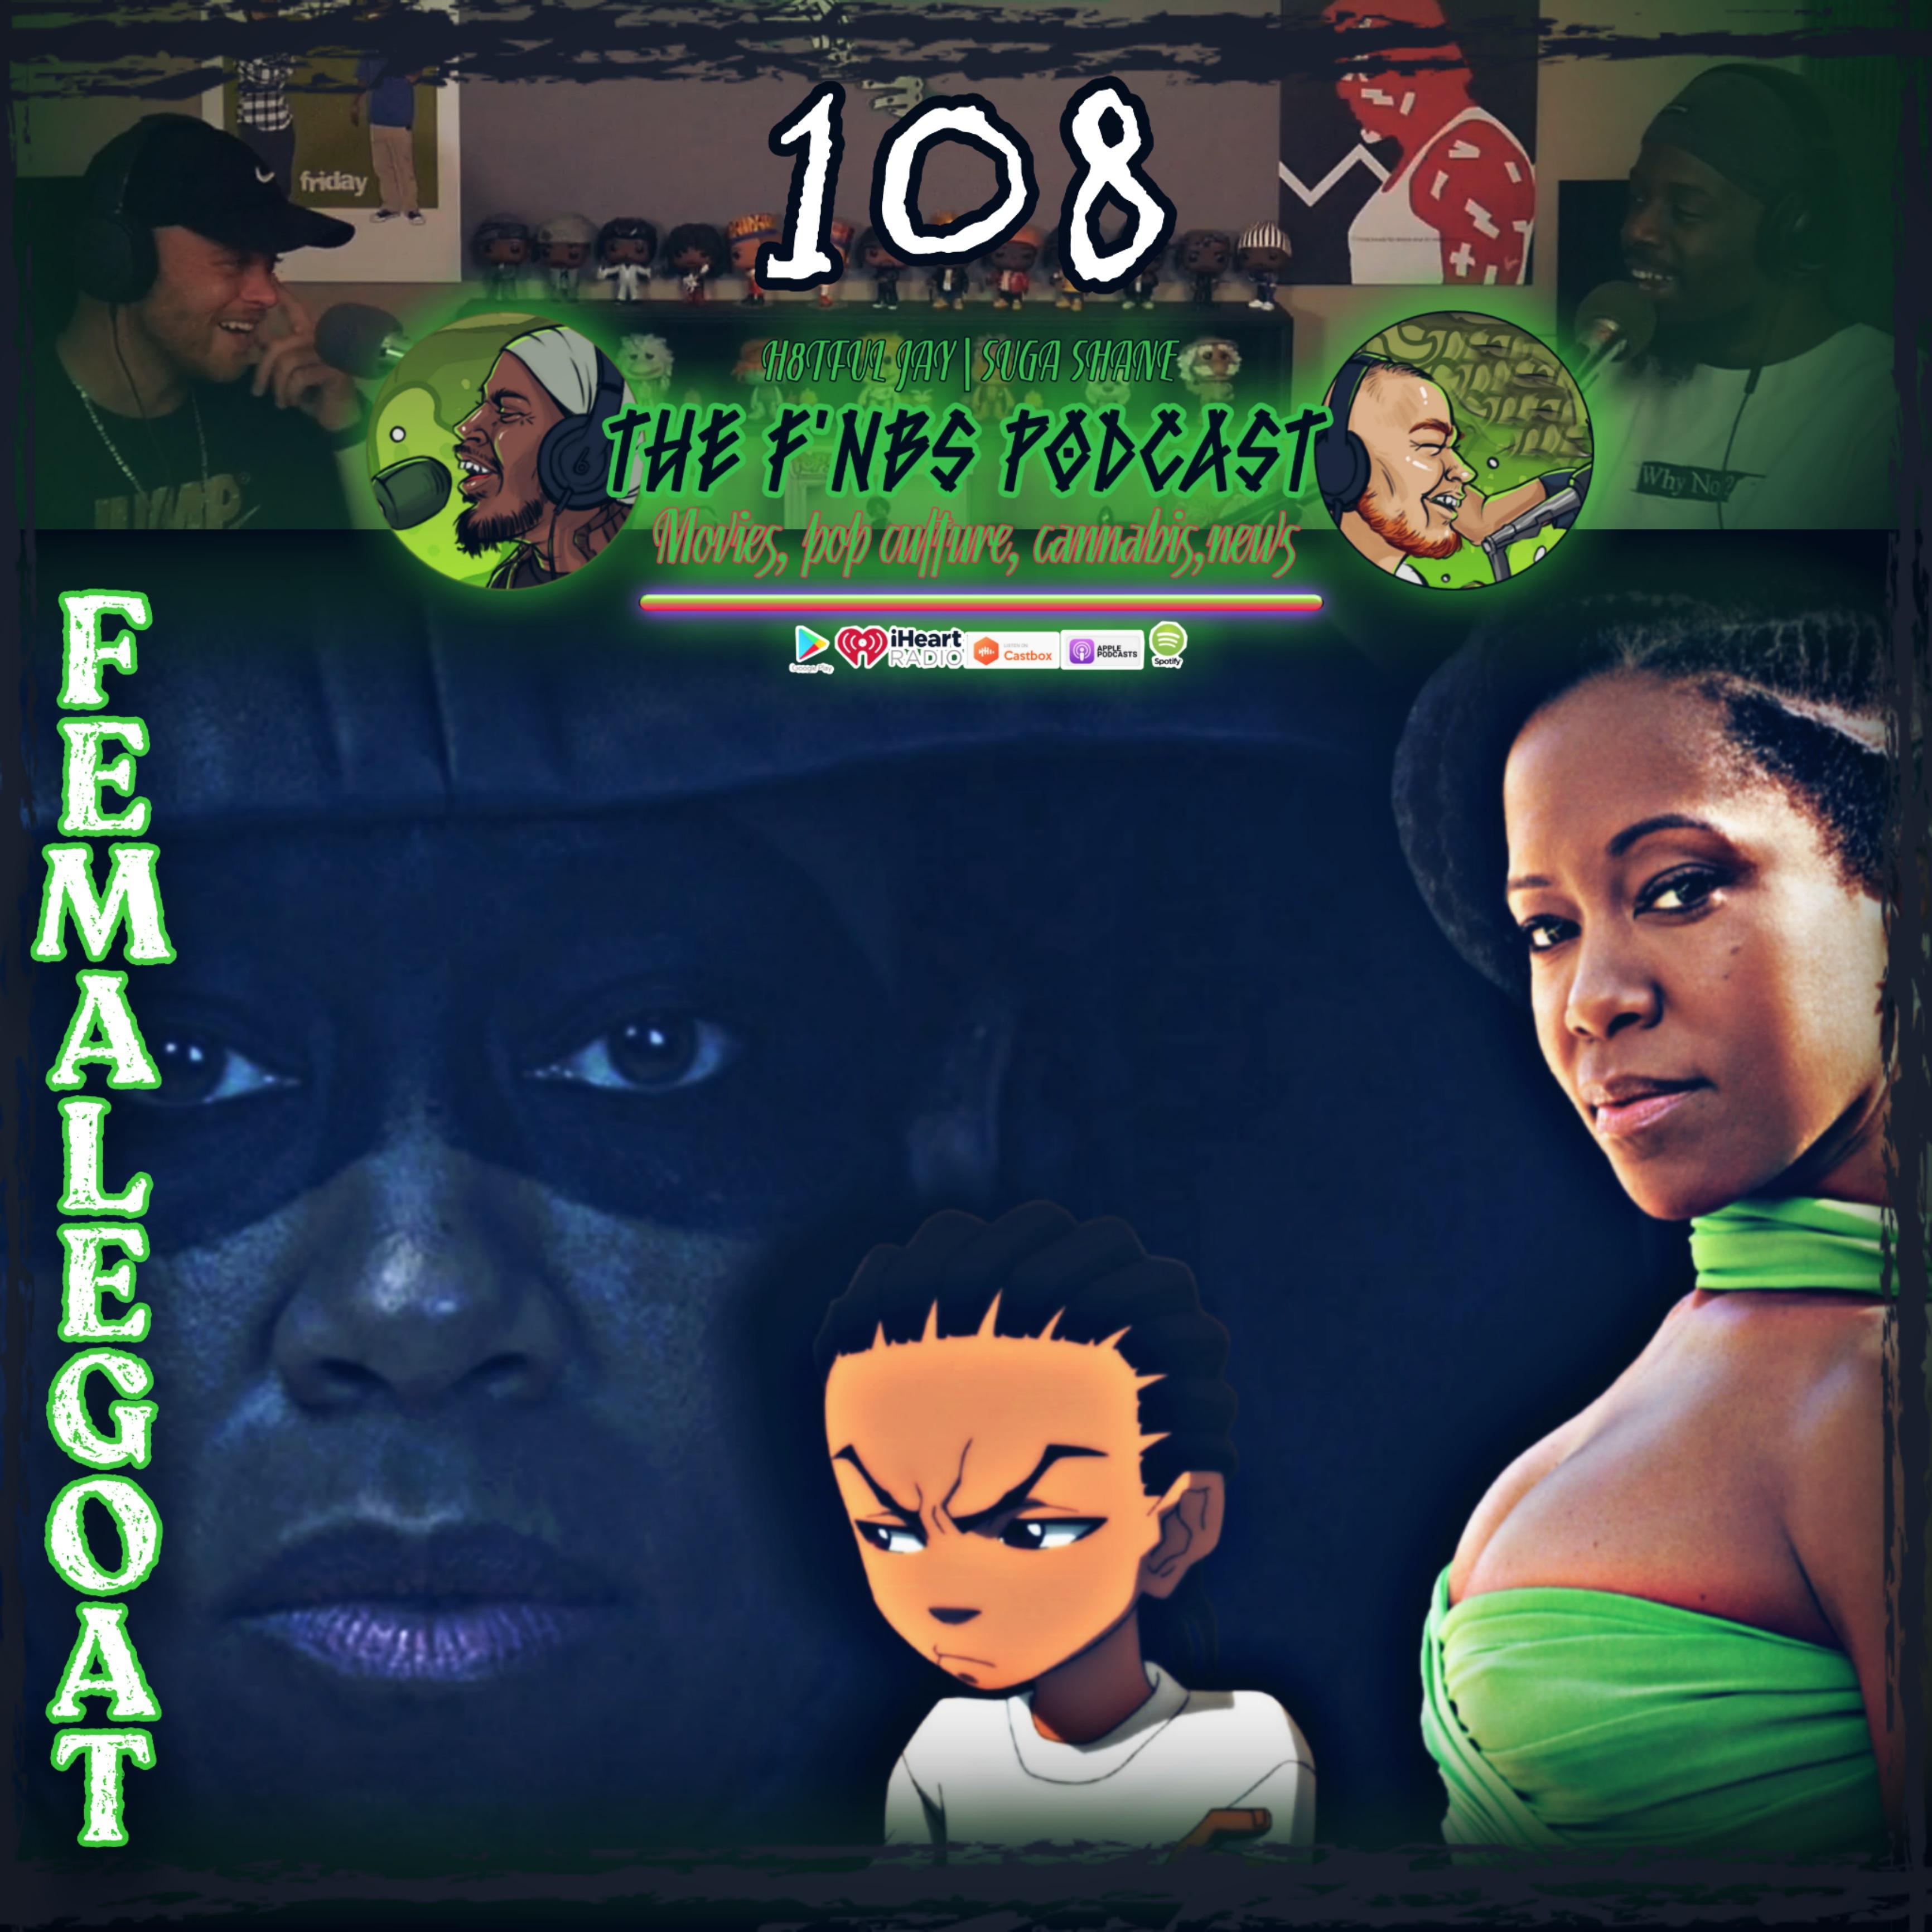 Artwork for THE F'NBS PODCAST EP. 108  FEMALE GOAT  H8TFUL JAY & SUGA SHANE